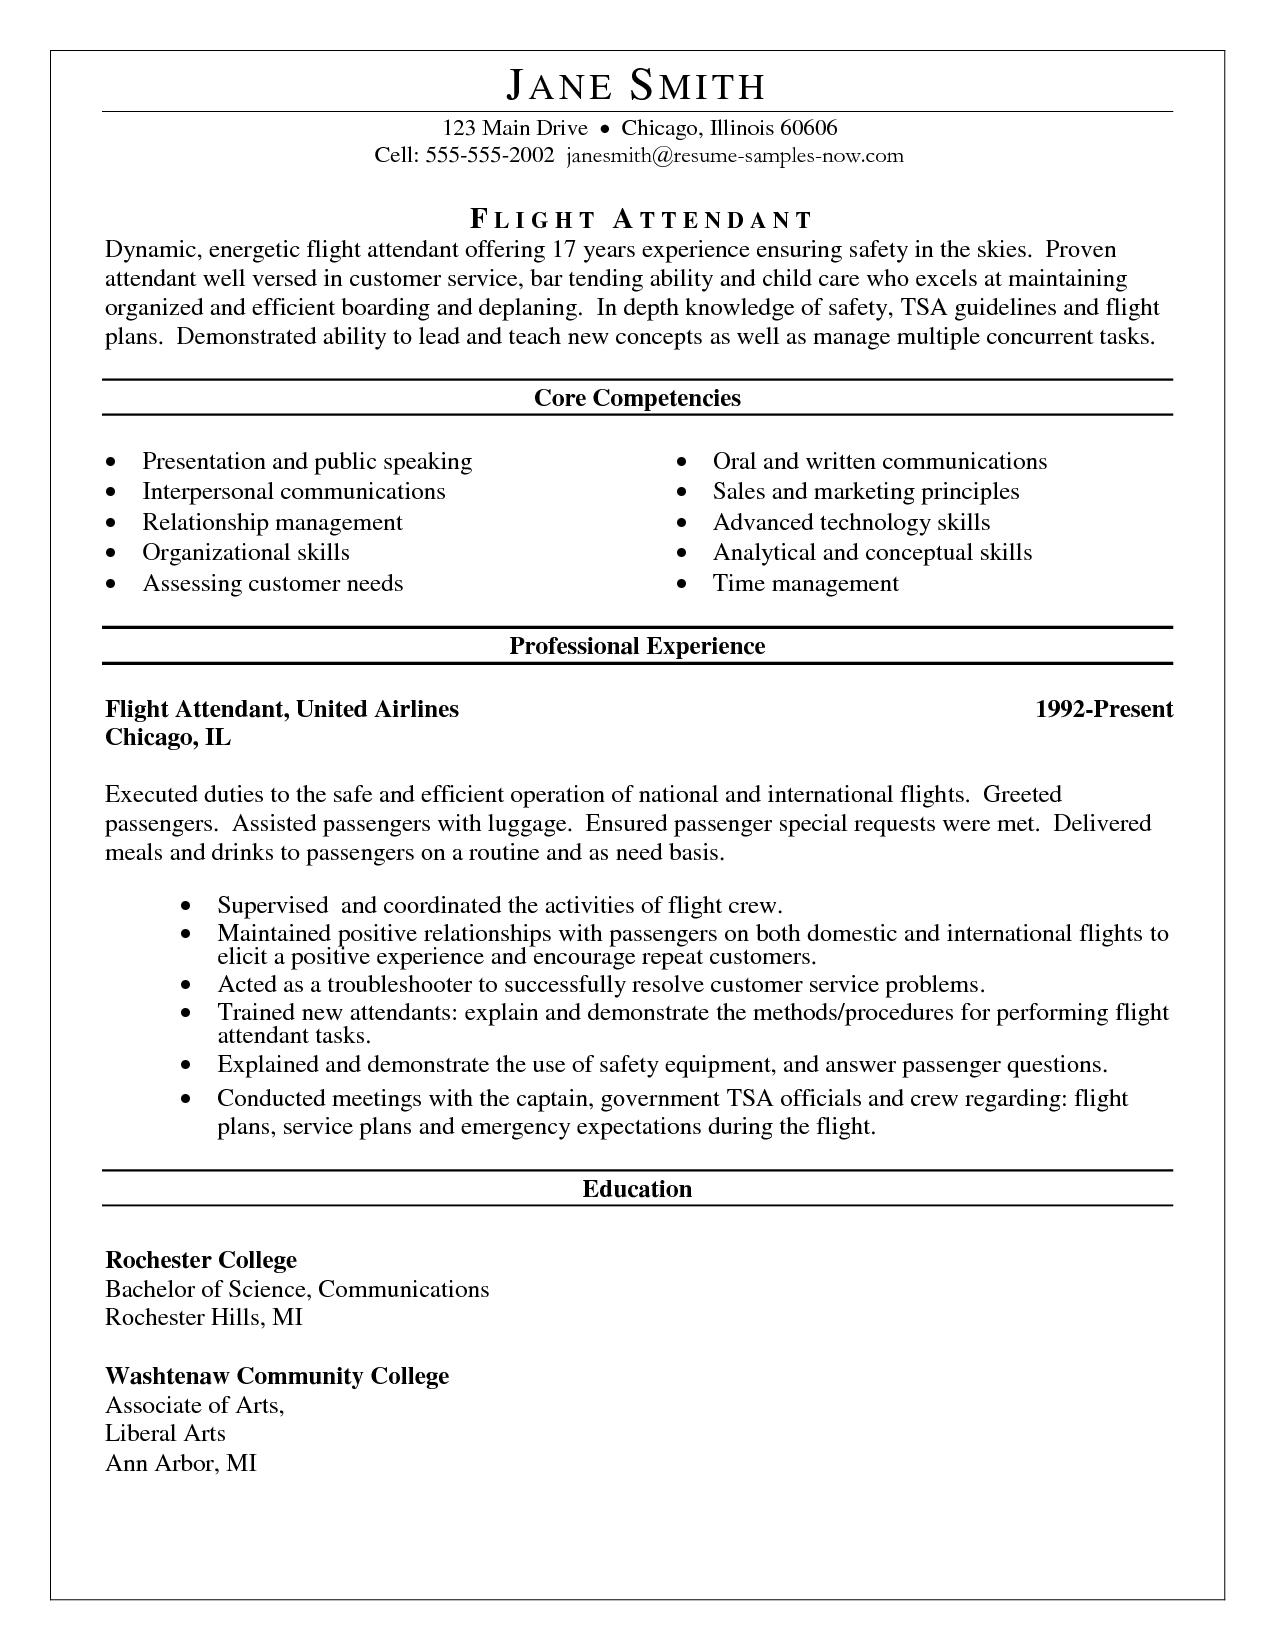 Resume Examples Key Competencies Competencies Examples Resume Resumeexamples Resume Examples Teacher Resume Examples Job Resume Examples